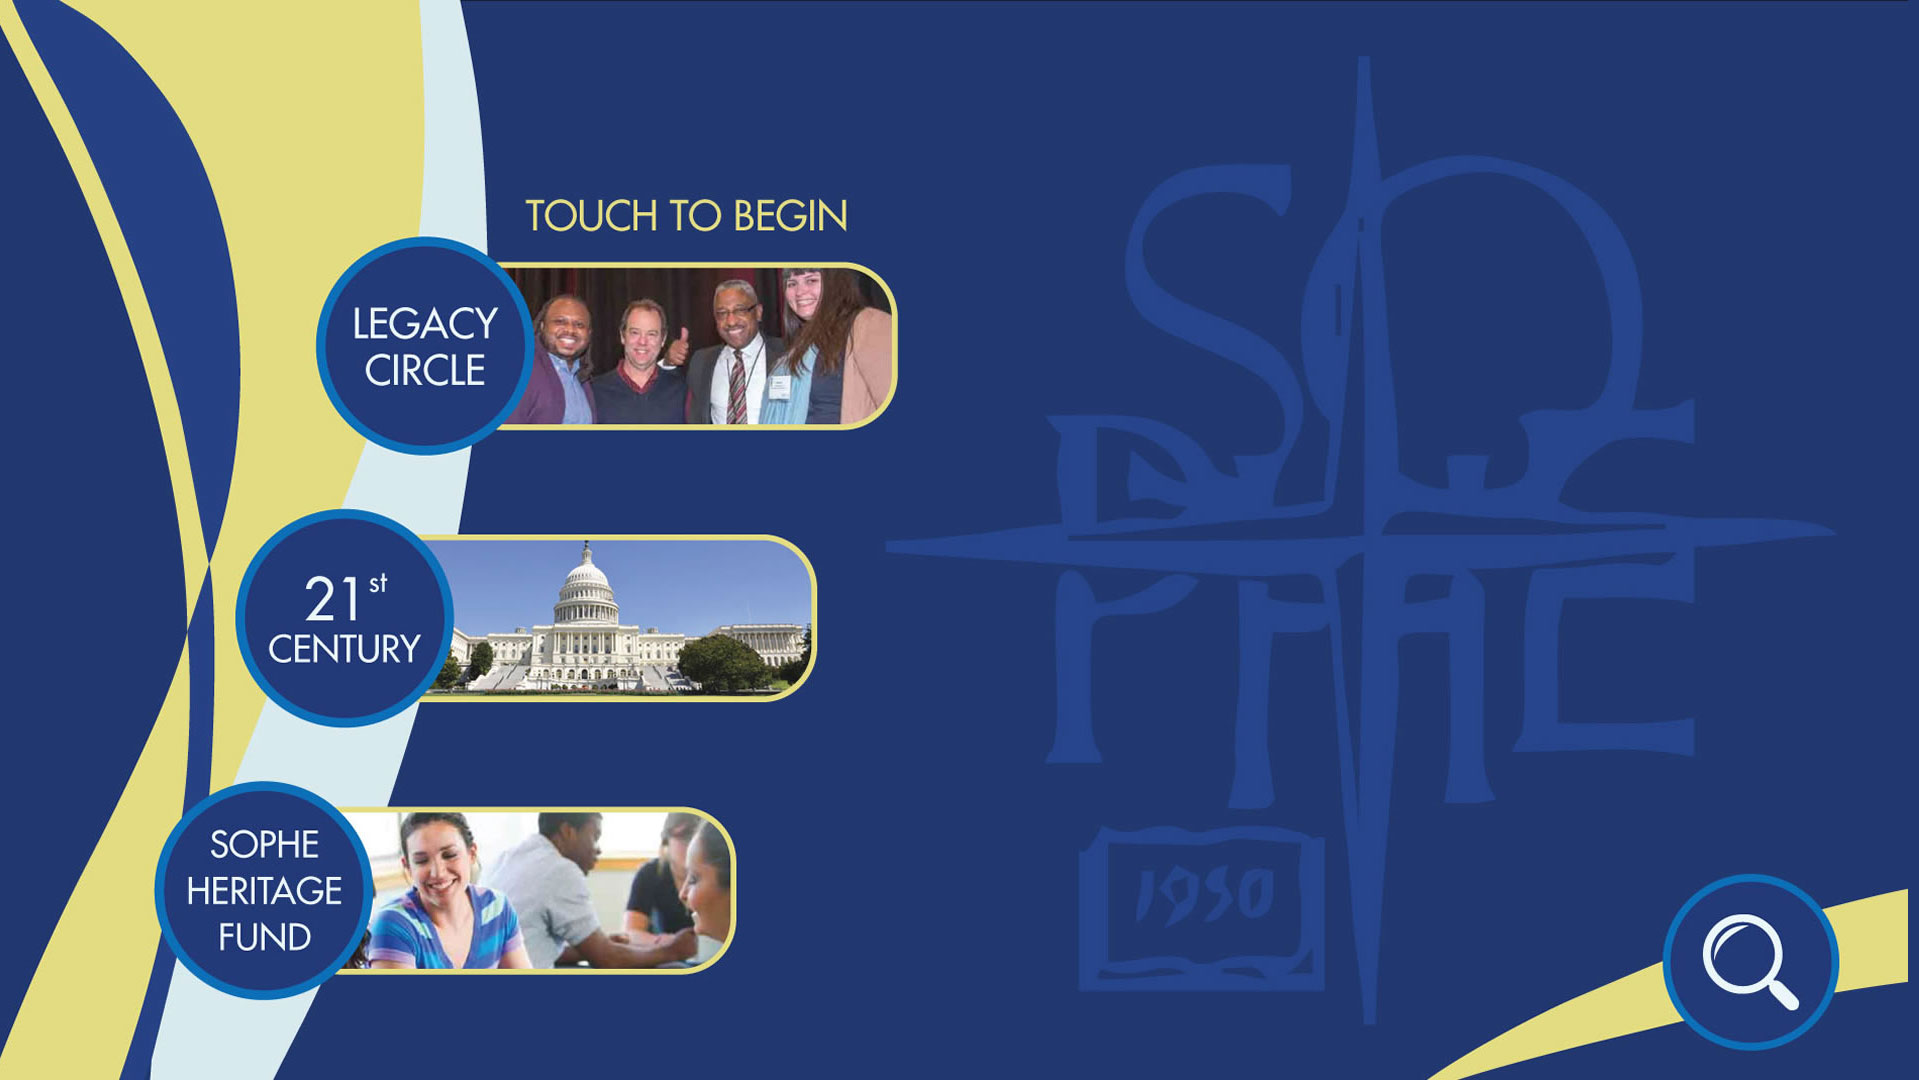 SOPHE's Legacy Circle Fund